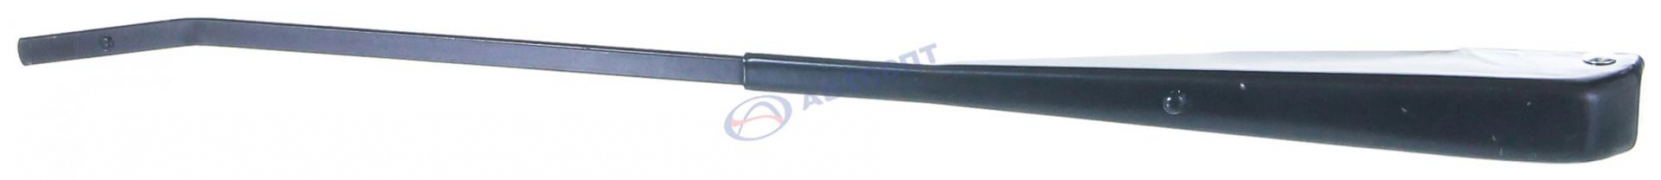 Рычаг стеклоочистителя ВАЗ-2108,09. передний (33.5205-800)